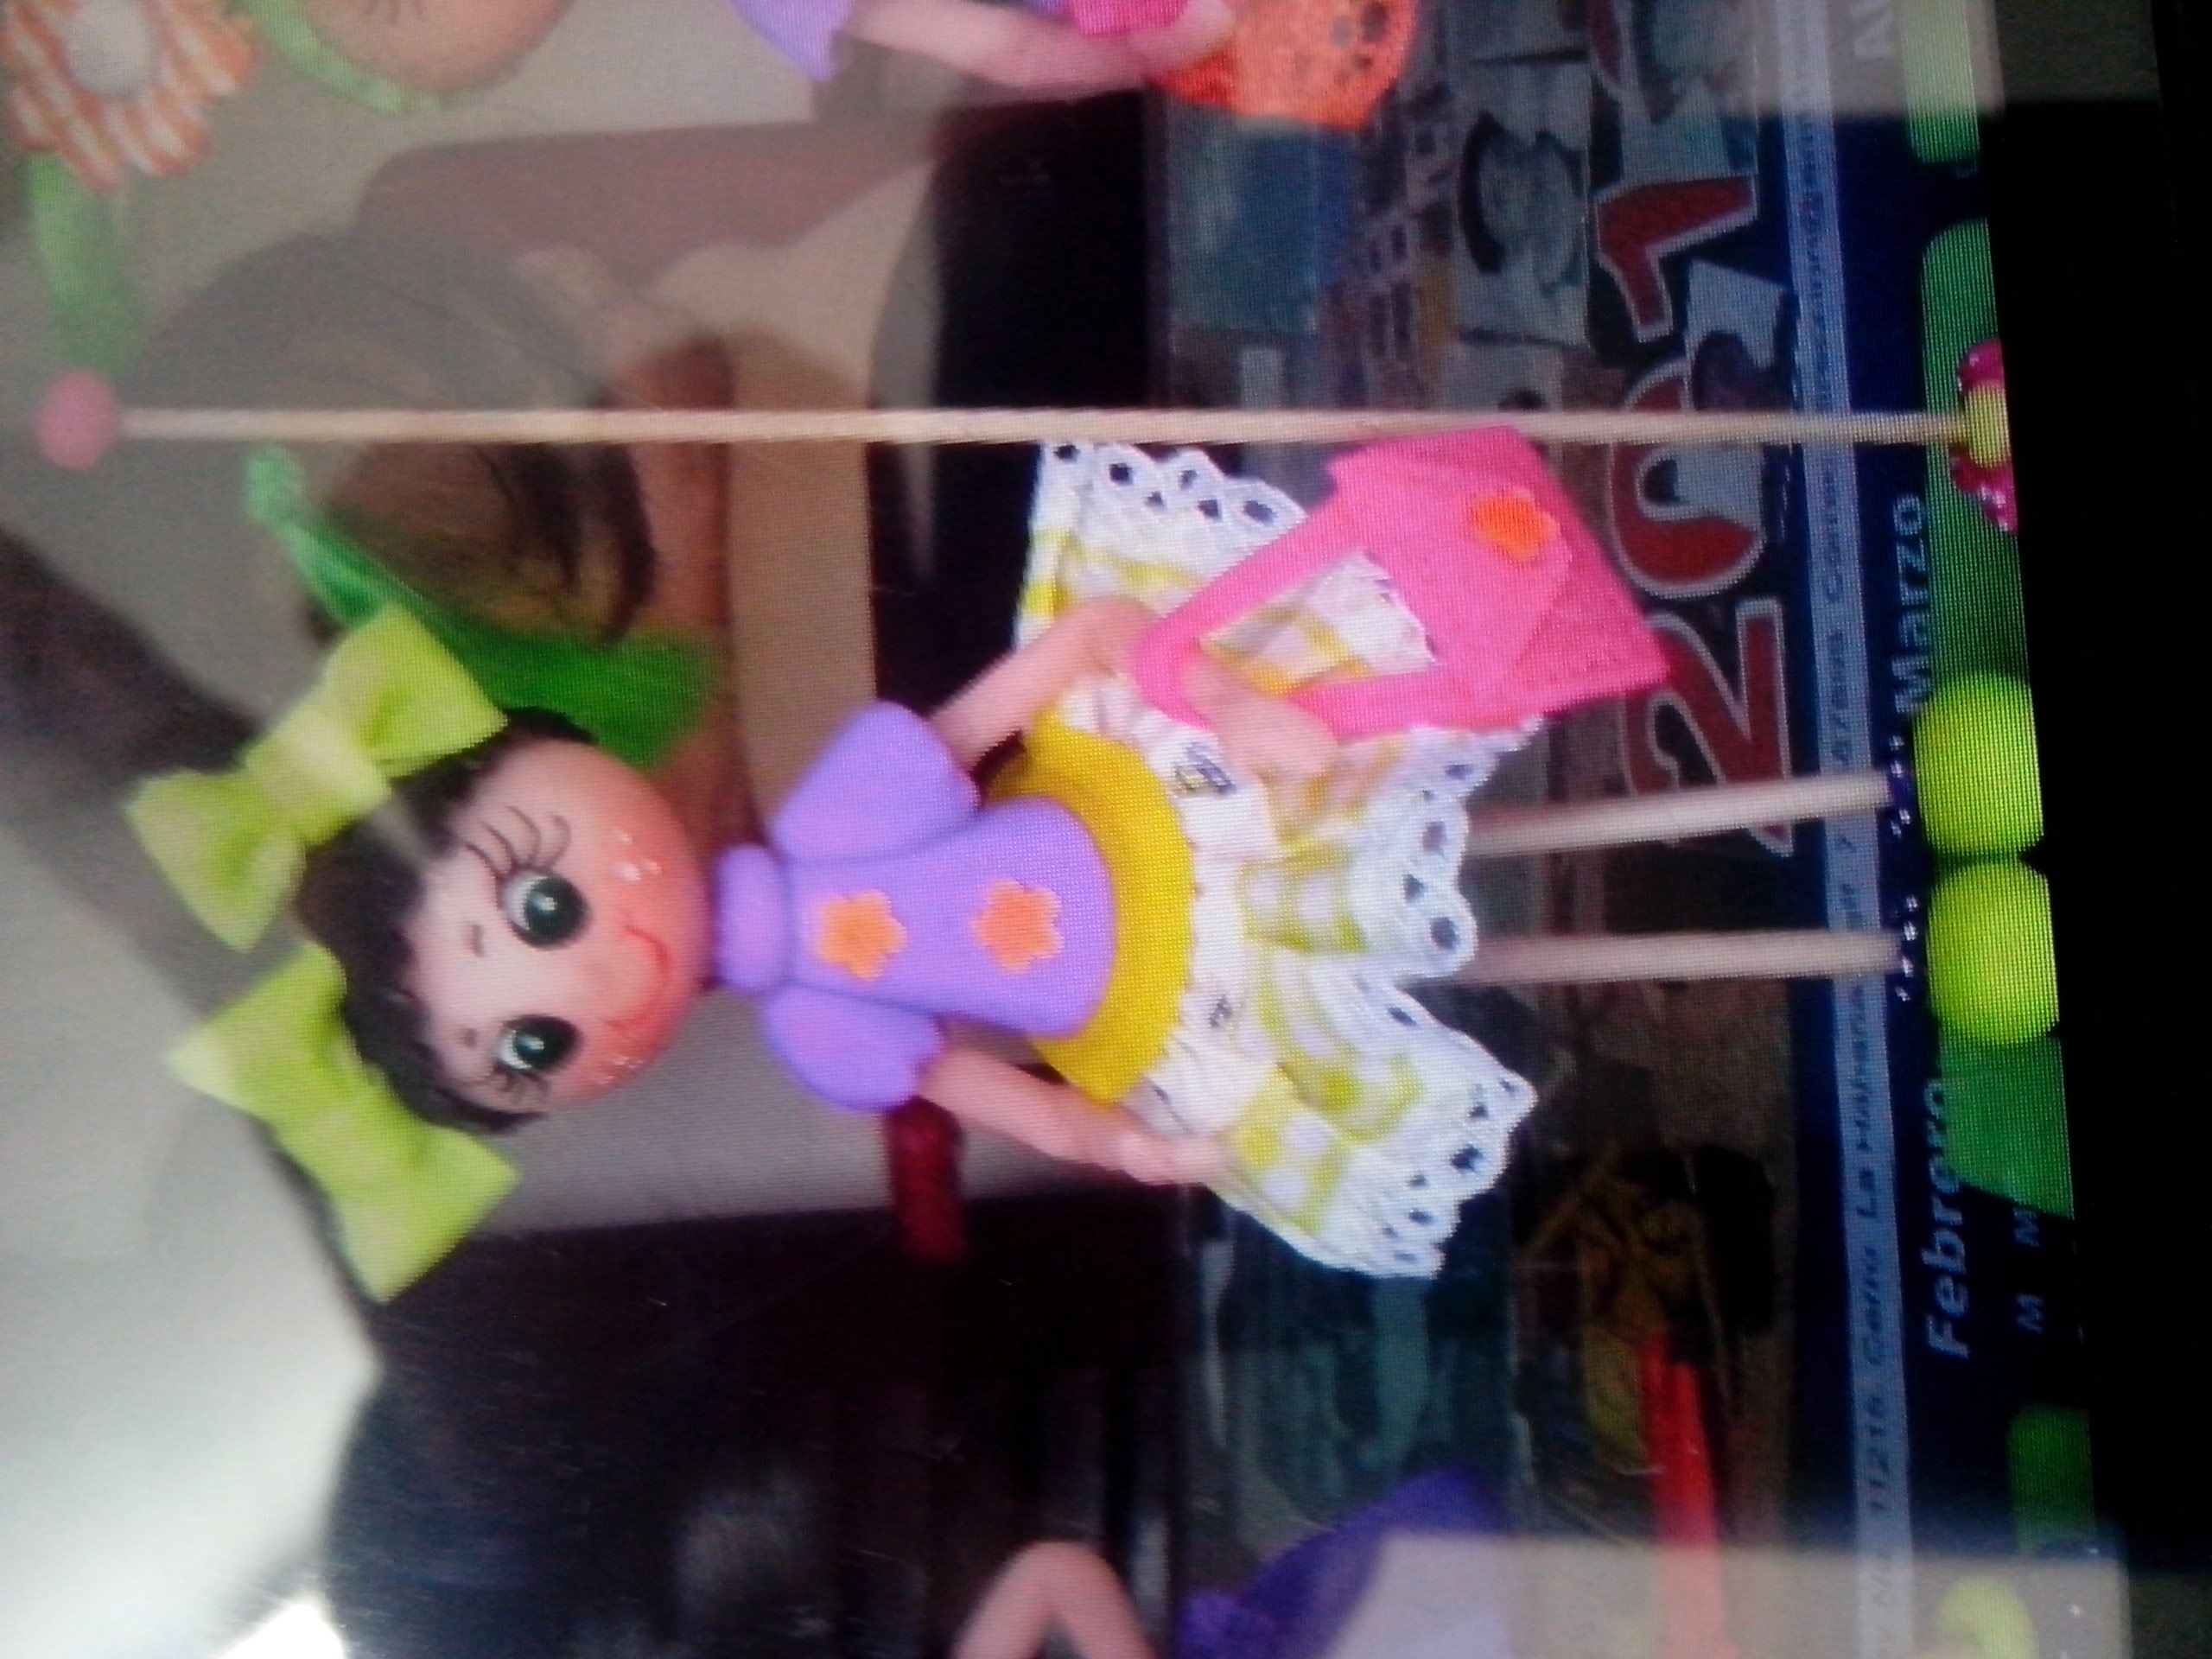 Pin by yamy on mis muñecas de porcelana fria | Pinterest